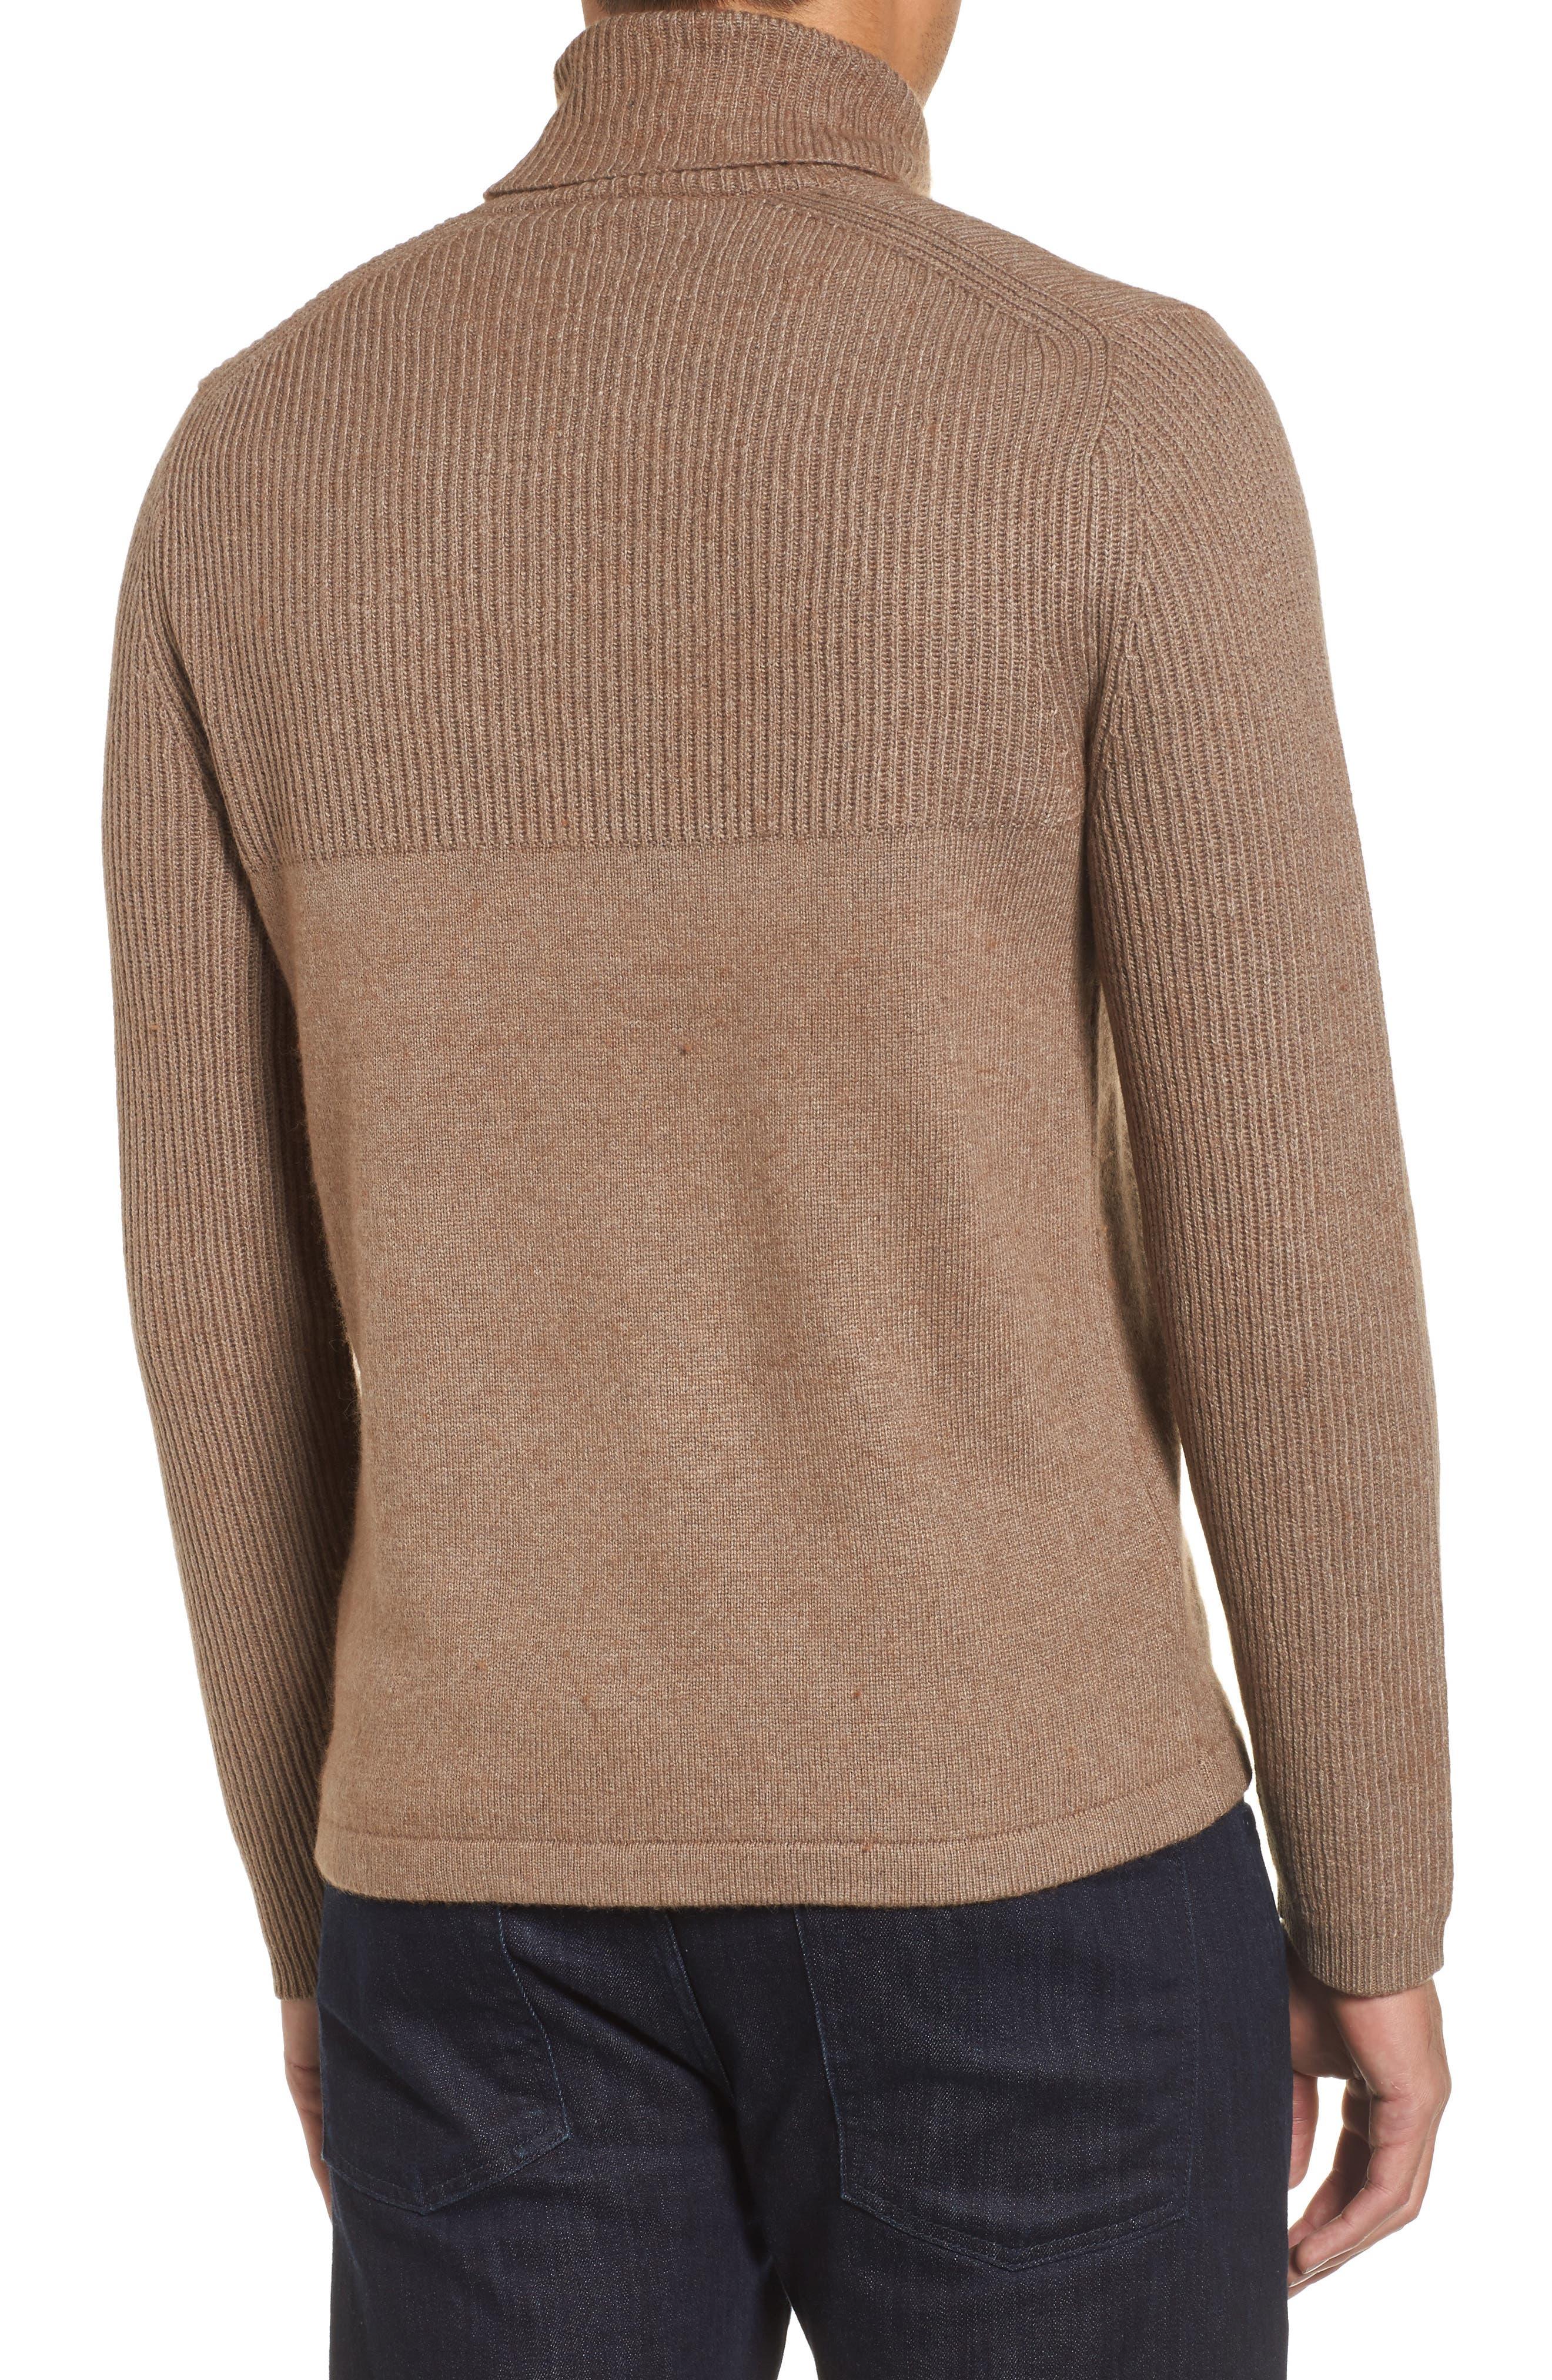 Mix Stitch Turtleneck Sweater,                             Alternate thumbnail 2, color,                             261